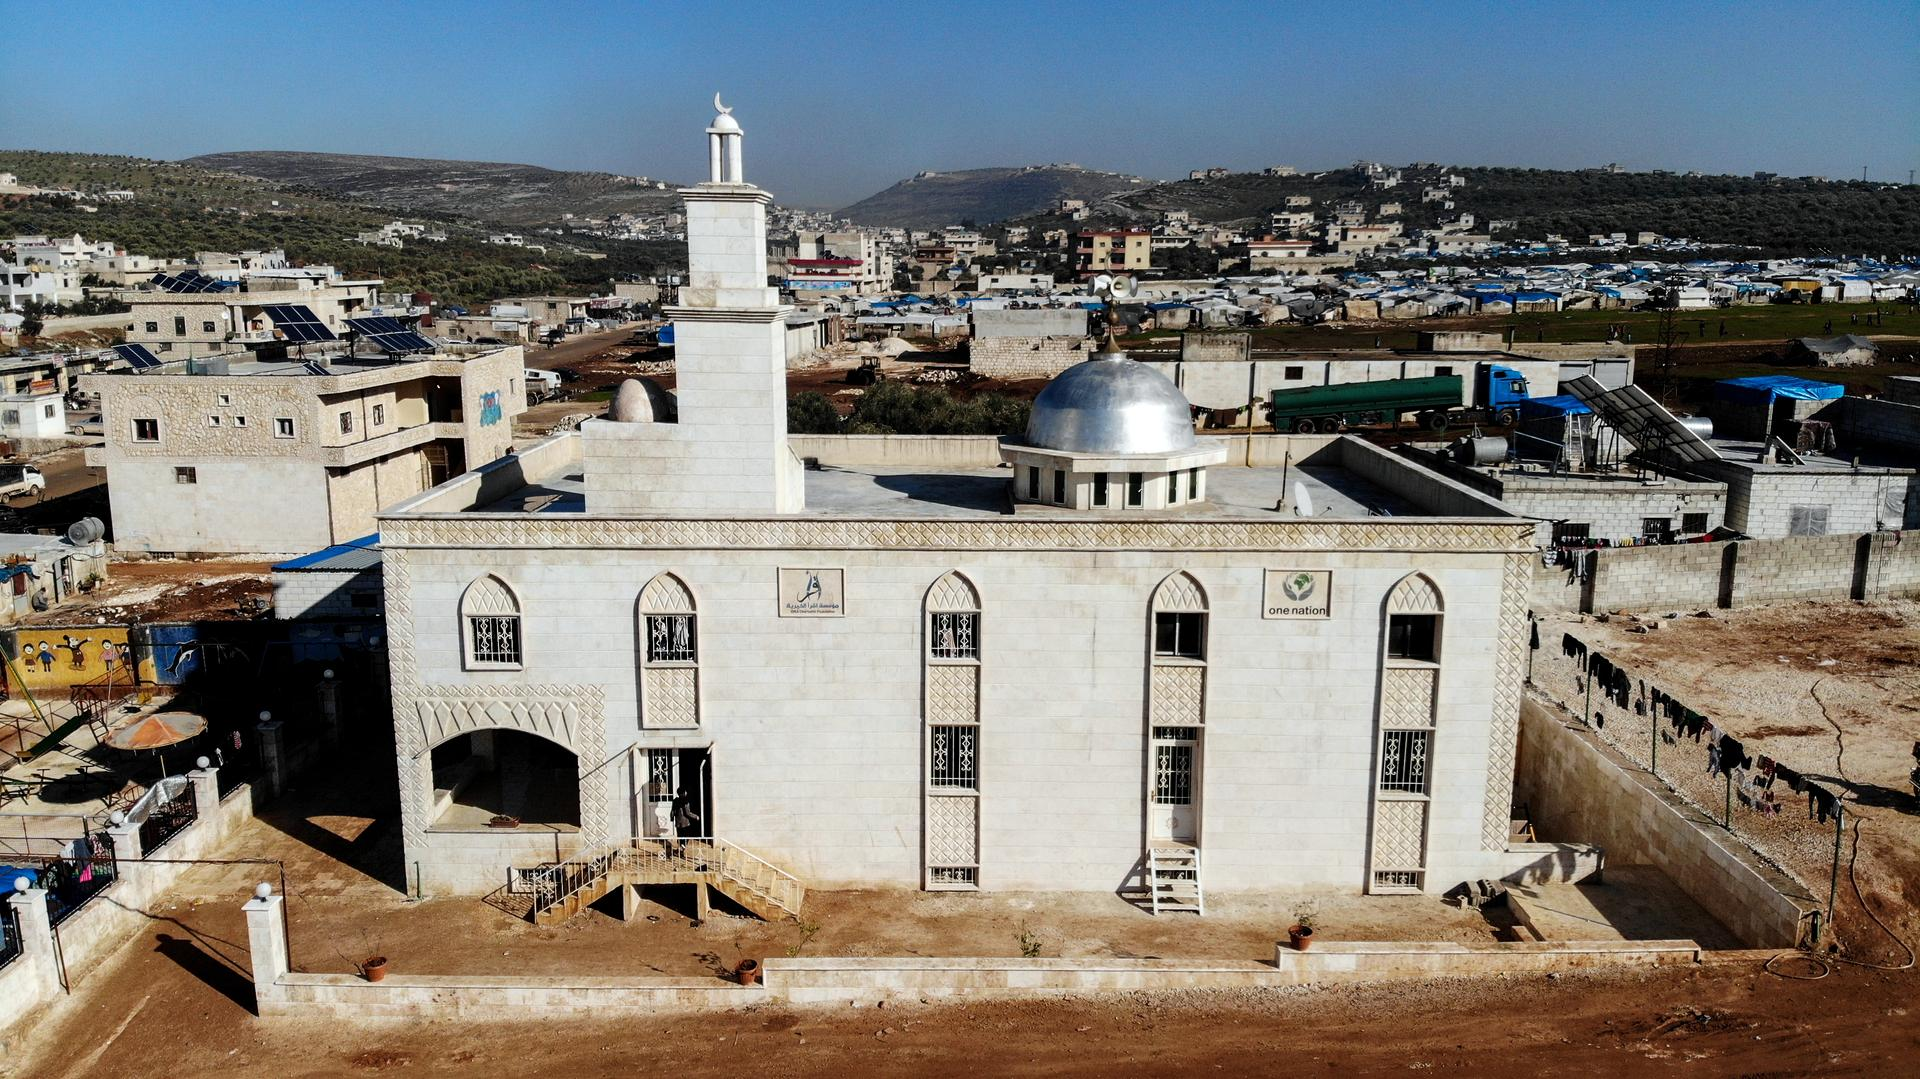 Services - Infrastructure - Masjid Ali Banat